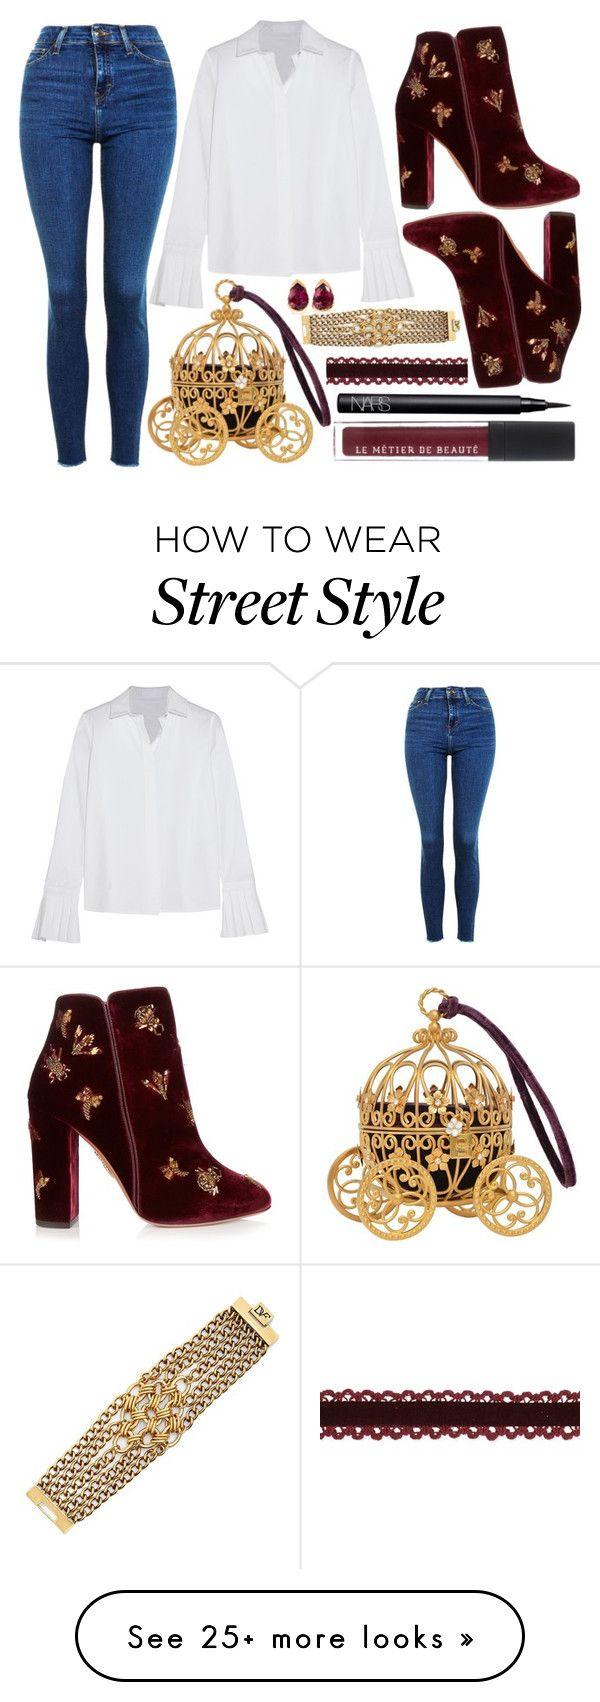 """street style"" by sisaez on Polyvore featuring Topshop, CO, Aquazzura, NARS Cosmetics, Diane Von Furstenberg and Fernando Jorge"